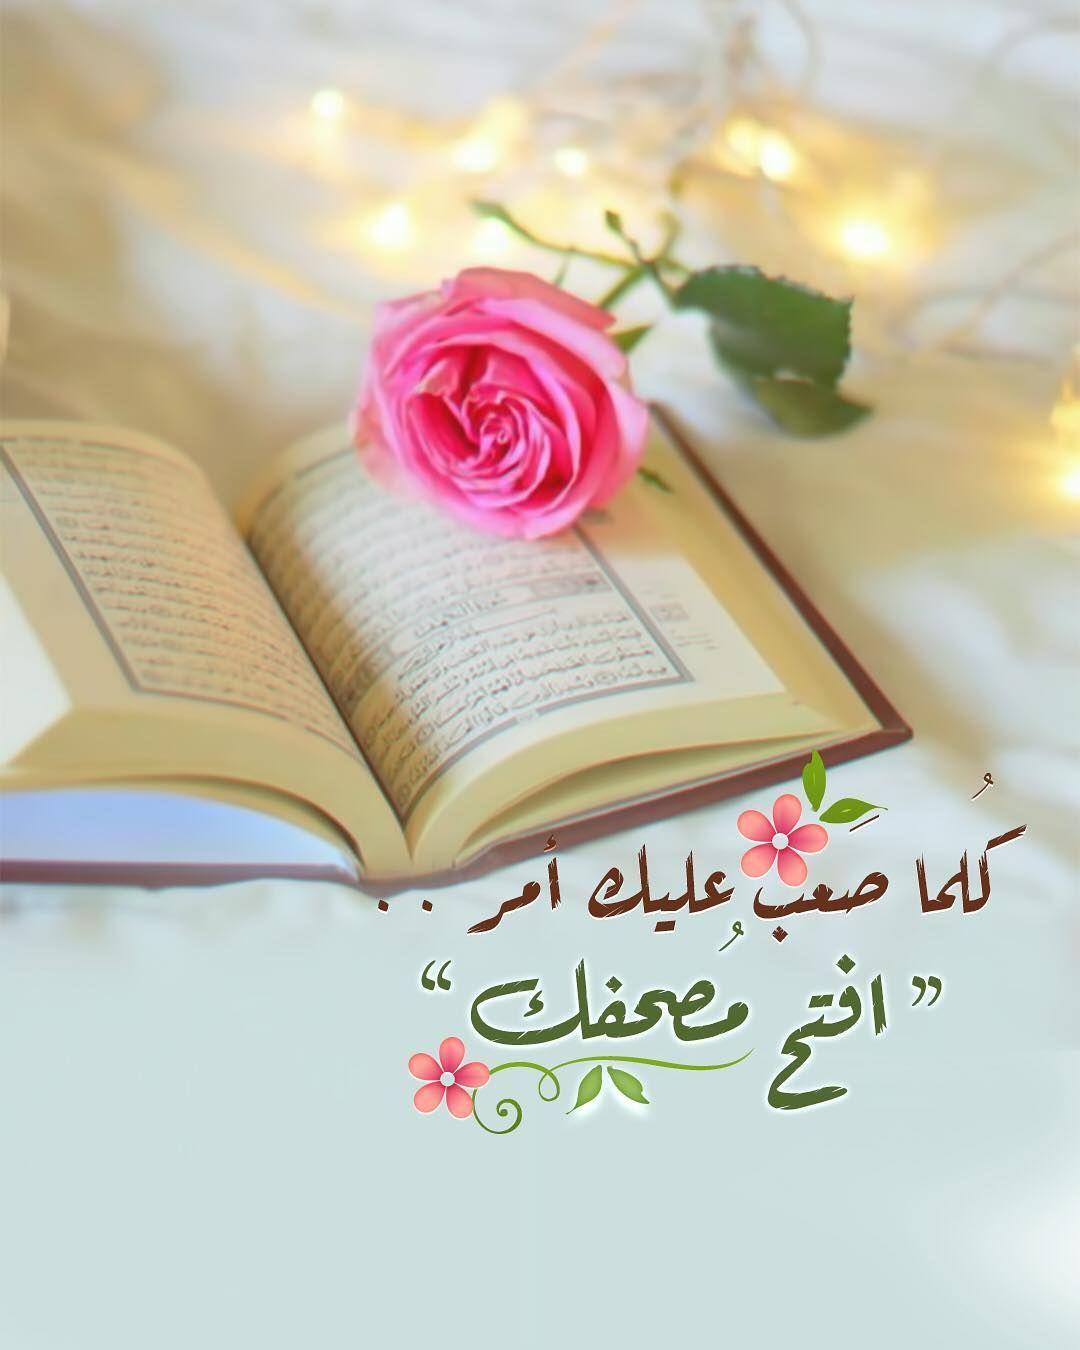 No Photo Description Available Quran Wallpaper Islamic Quotes Quran Islam For Kids